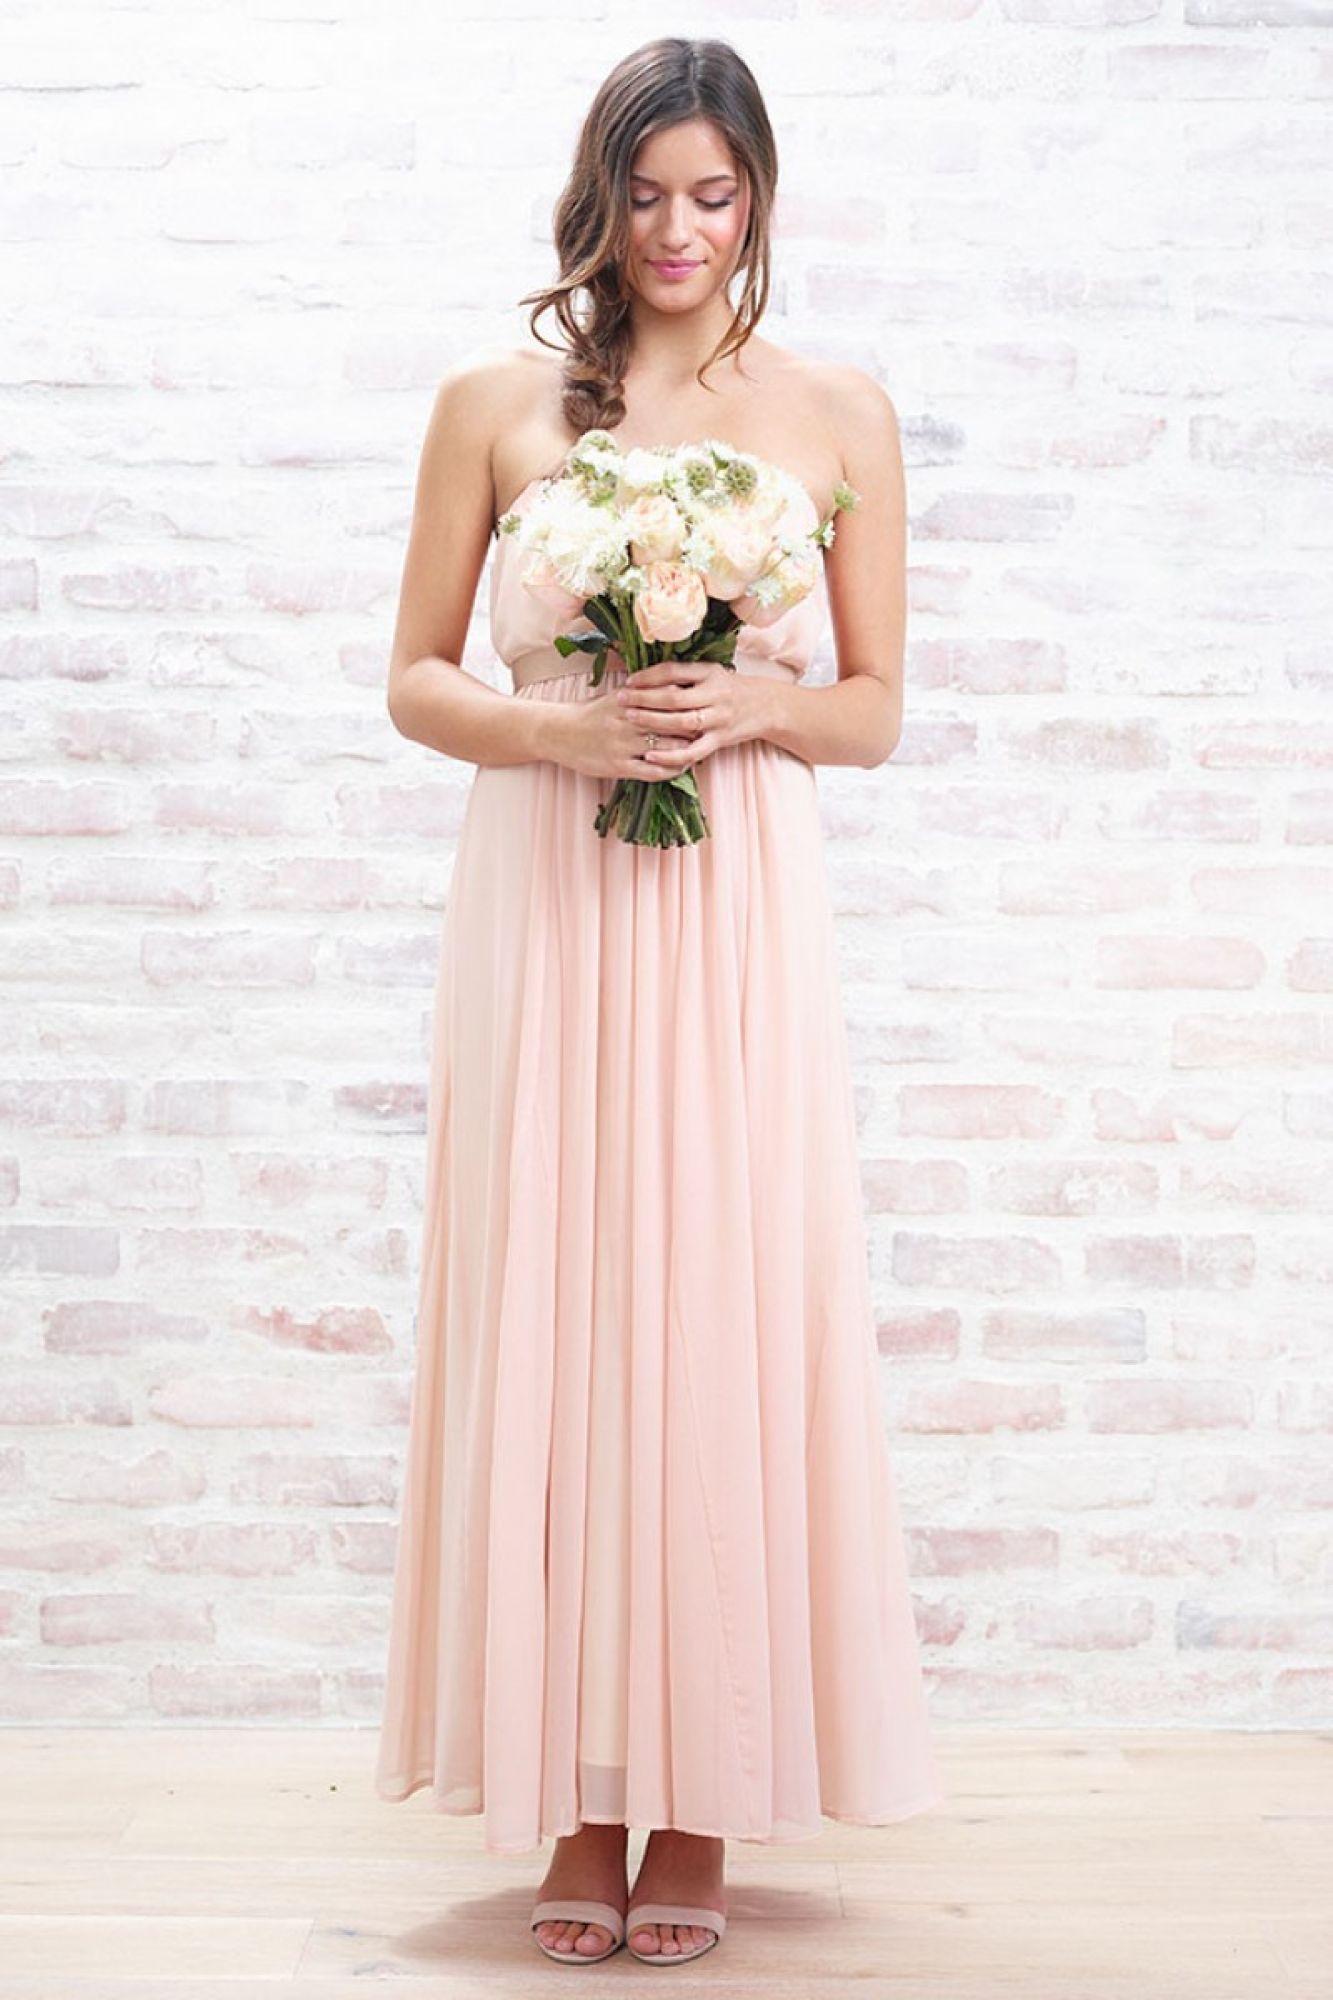 Lauren Conrad Blesses World With 12 Piece Bridesmaids Collection Designer Bridesmaid Dresses Bridesmaid Lauren Conrad Wedding Dress